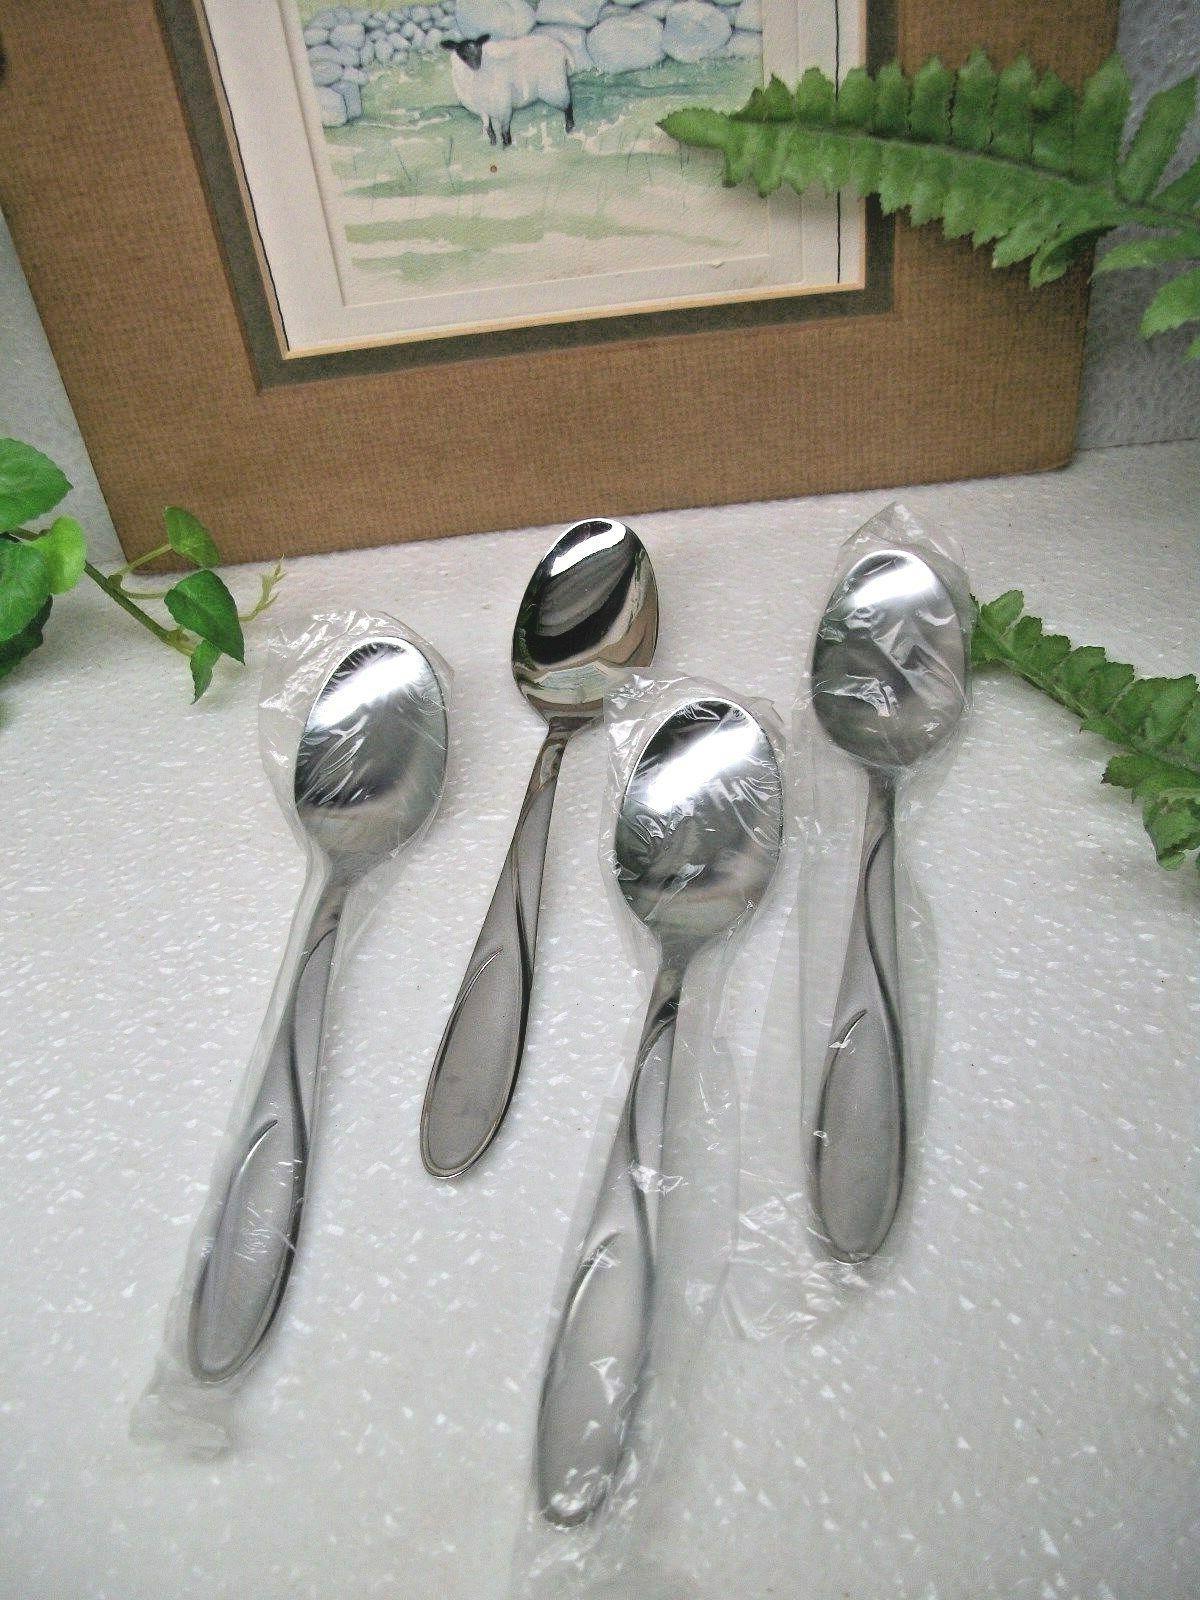 4 gabriella sand stainless steel teaspoons new